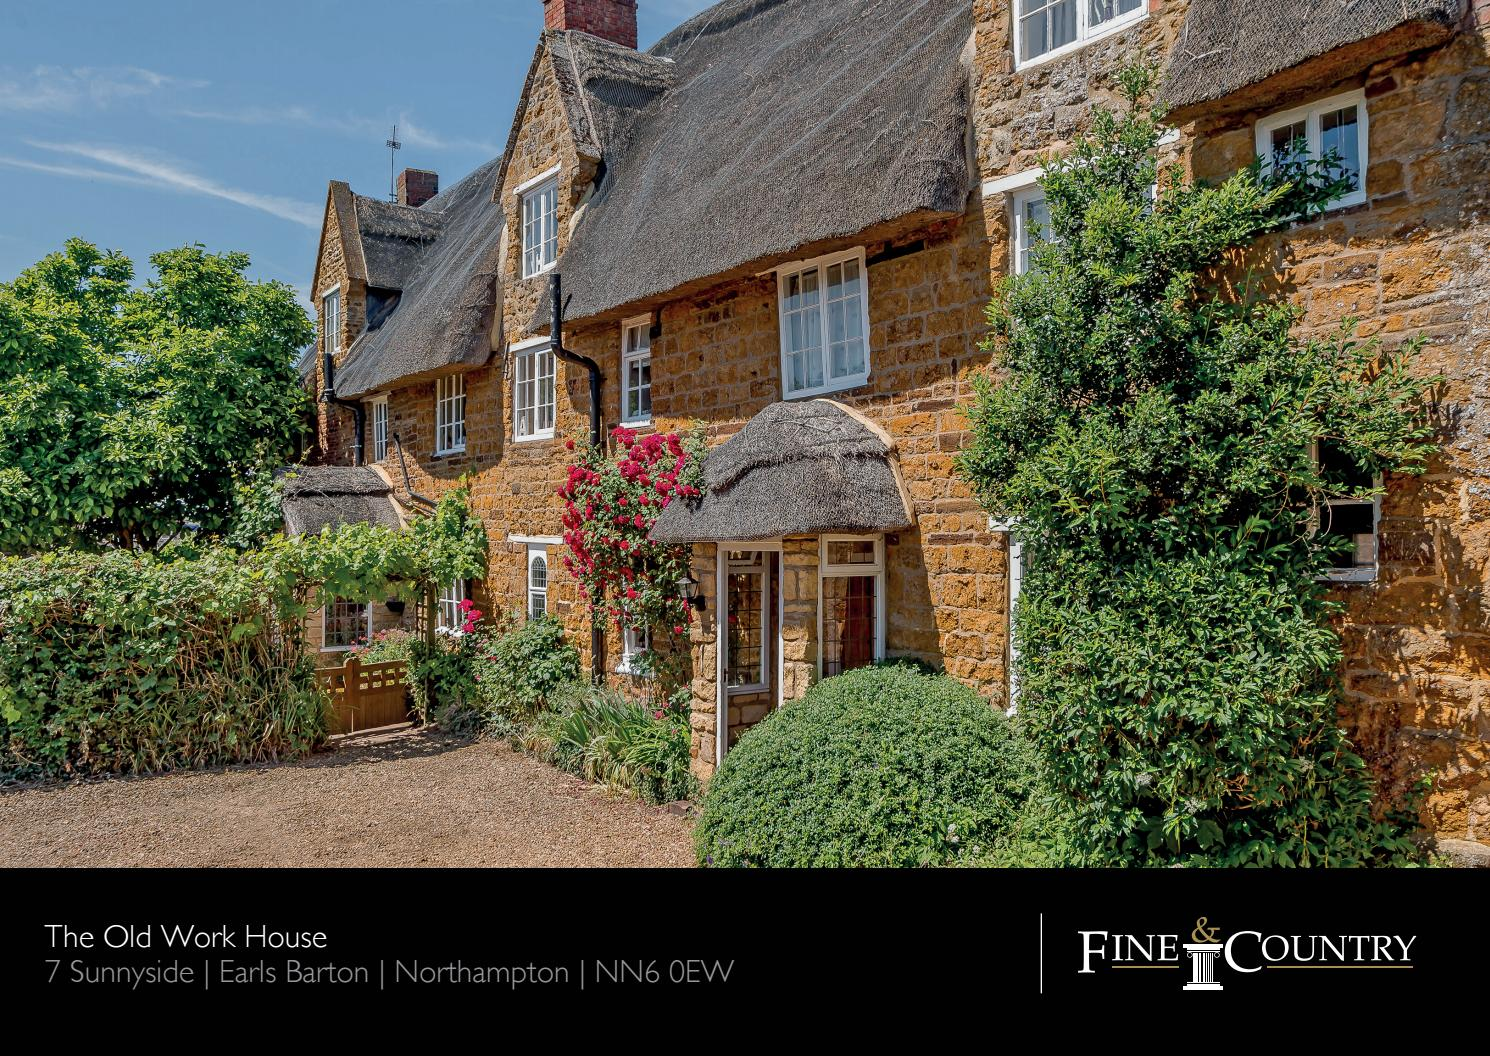 The Old Work House, Sunnyside, Earls Barton, Northants by Fine ...